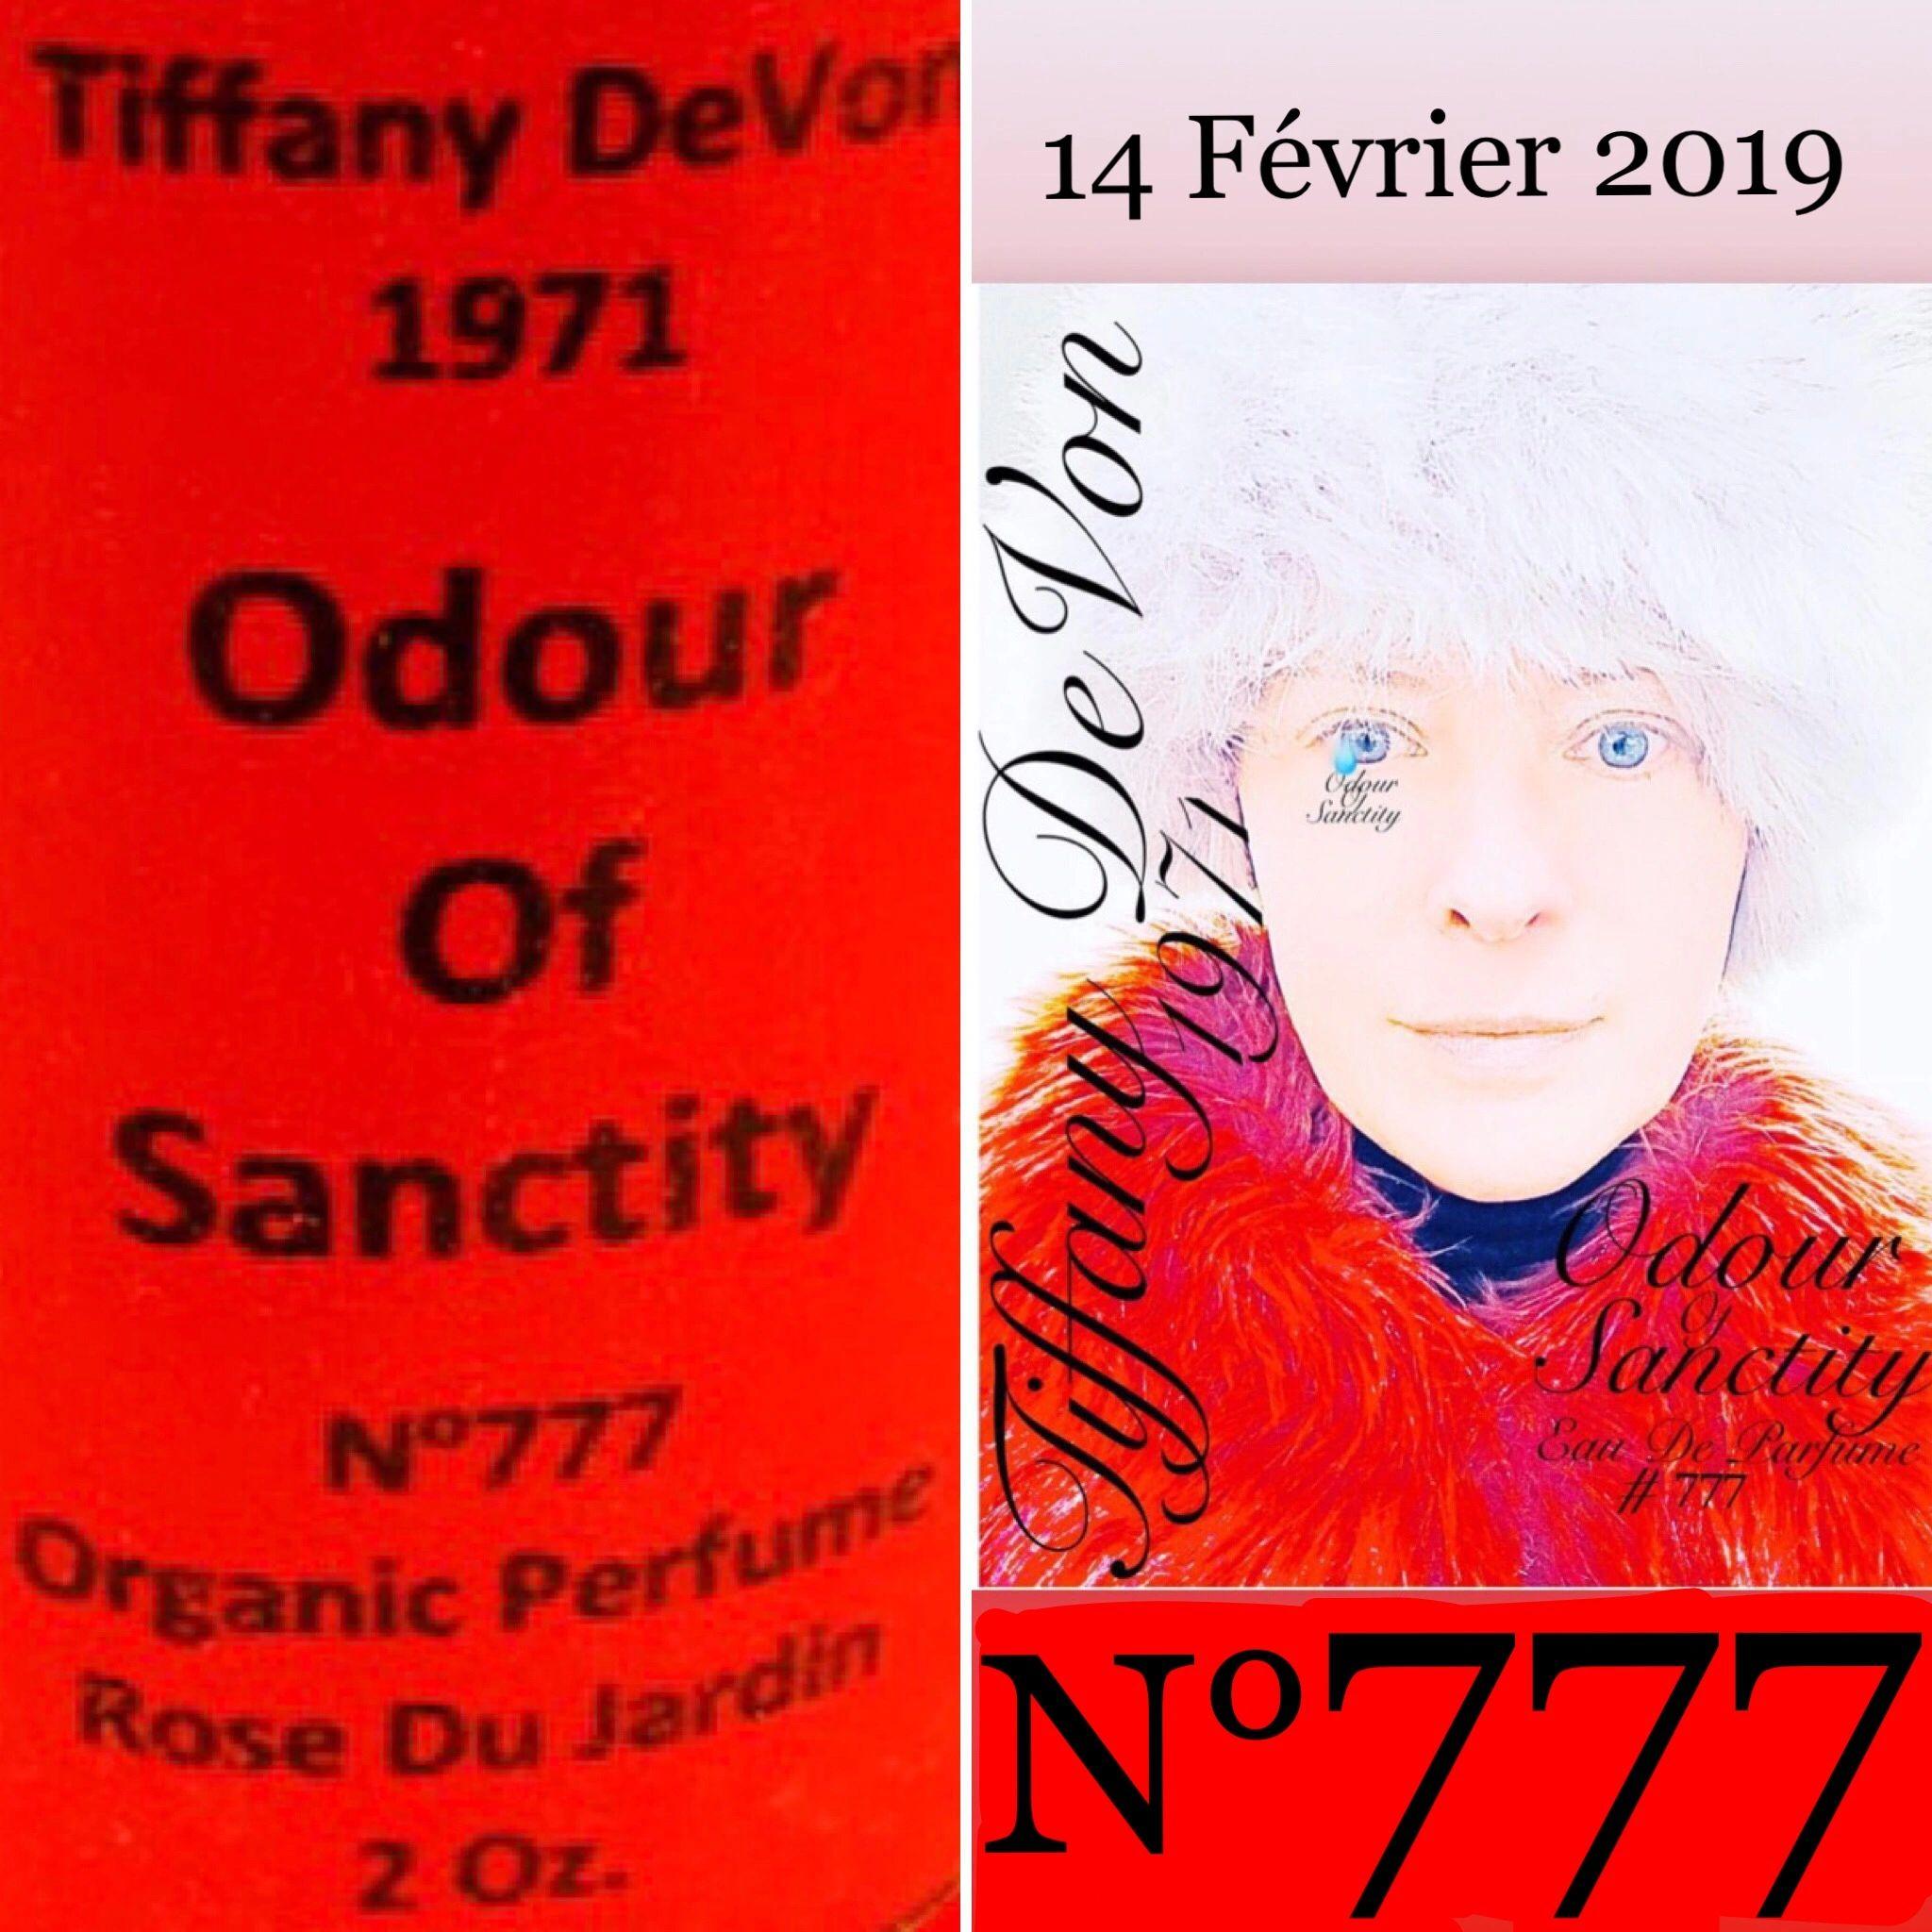 Tiffany DeVon 1971 Odour Of Sanctity N° 777 Rose Du Jardin🌹